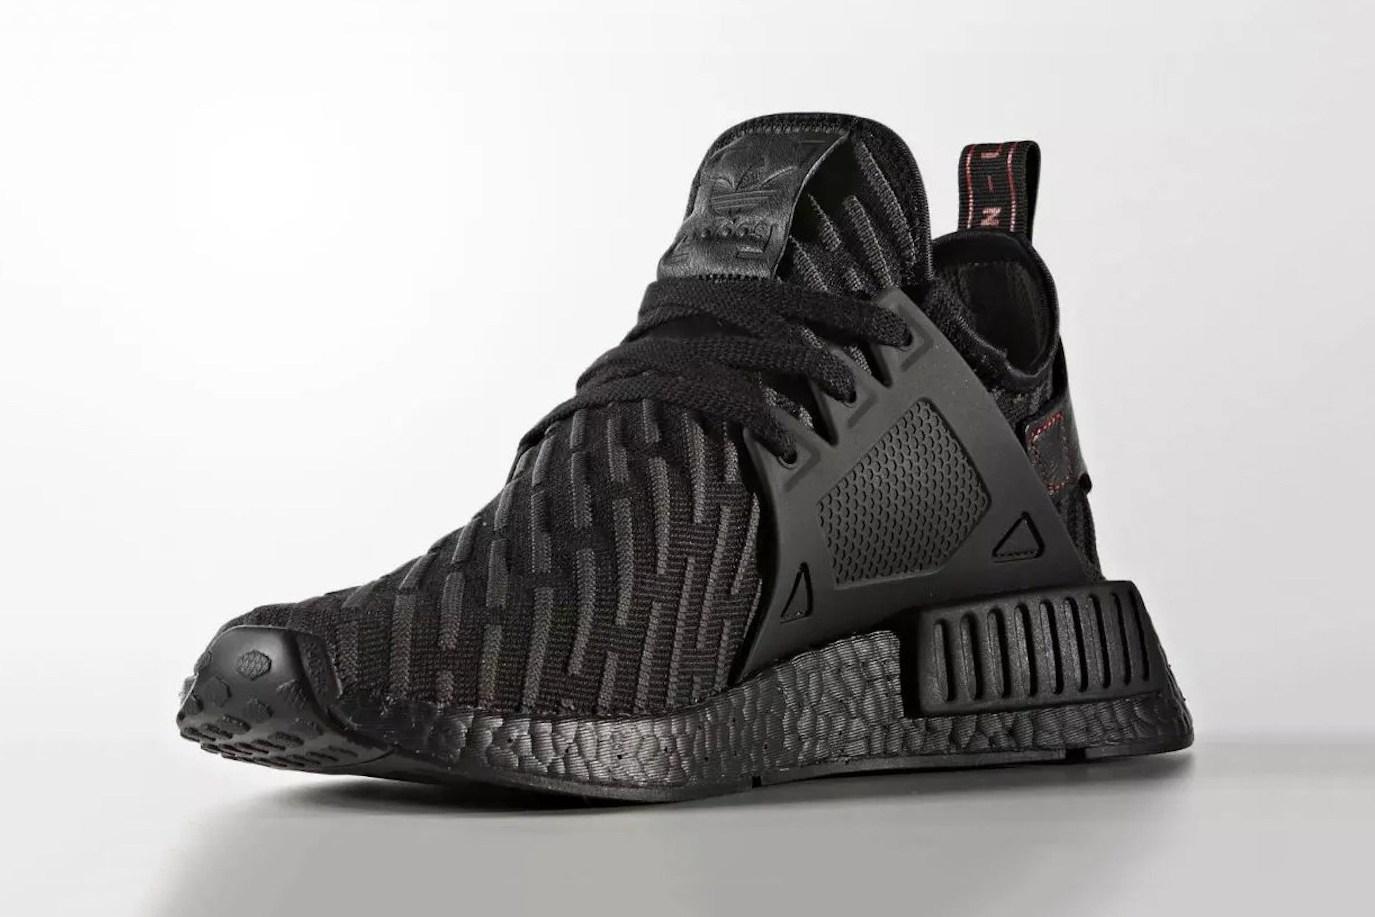 adidas-nmd-xr1-triple-black-closer-look-001